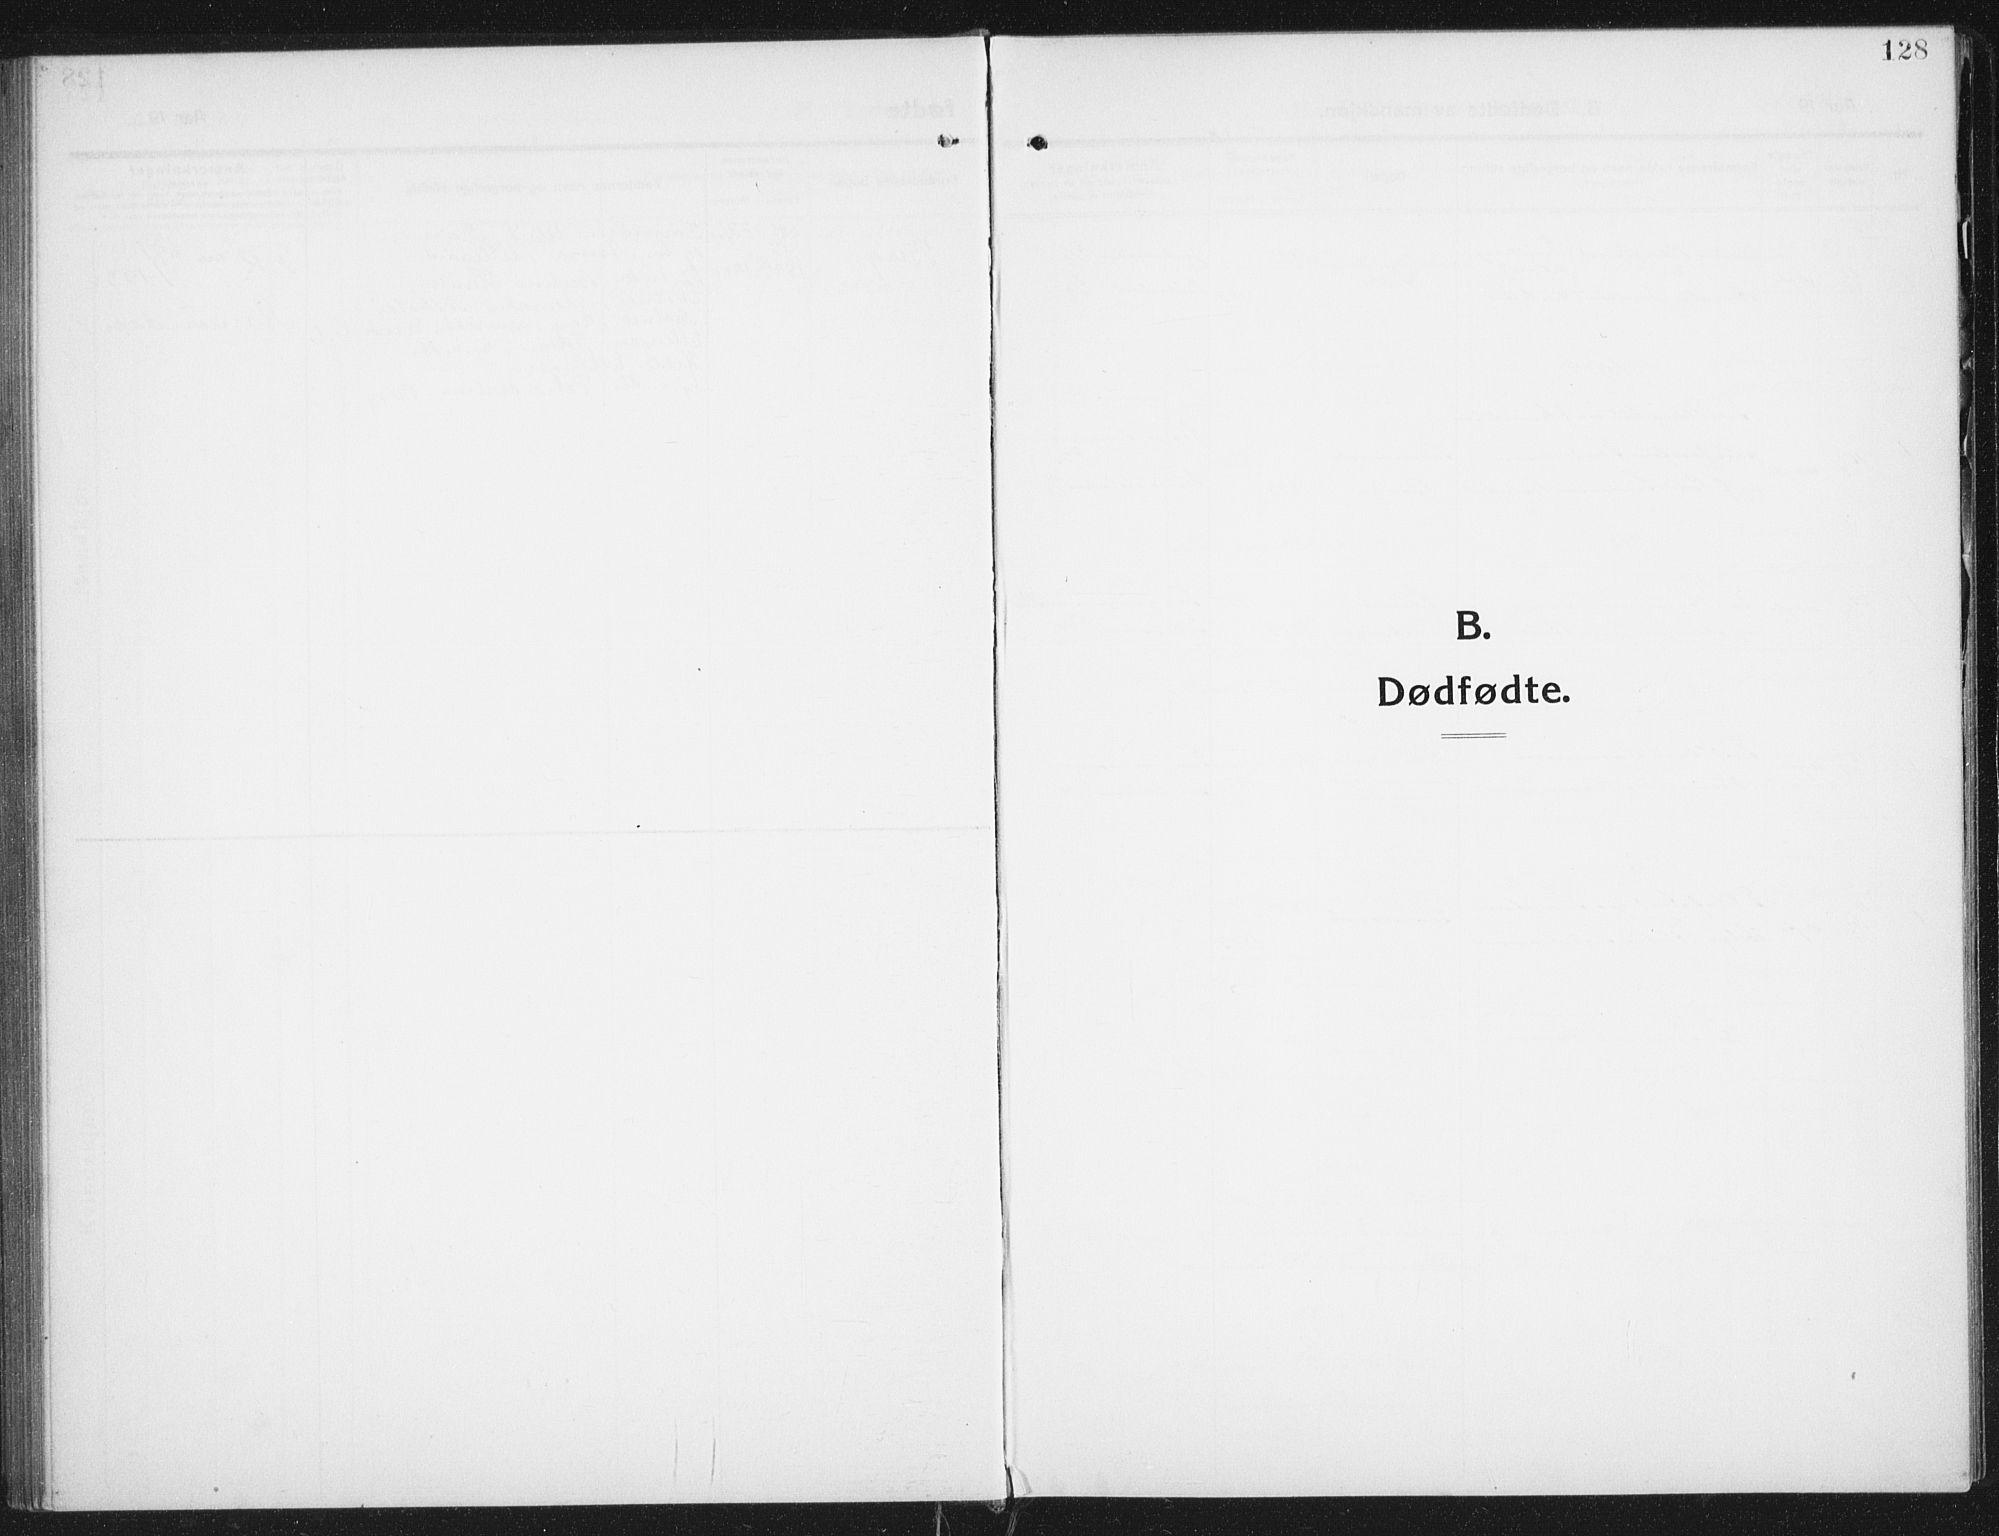 SAT, Ministerialprotokoller, klokkerbøker og fødselsregistre - Nordland, 882/L1183: Klokkerbok nr. 882C01, 1911-1938, s. 128